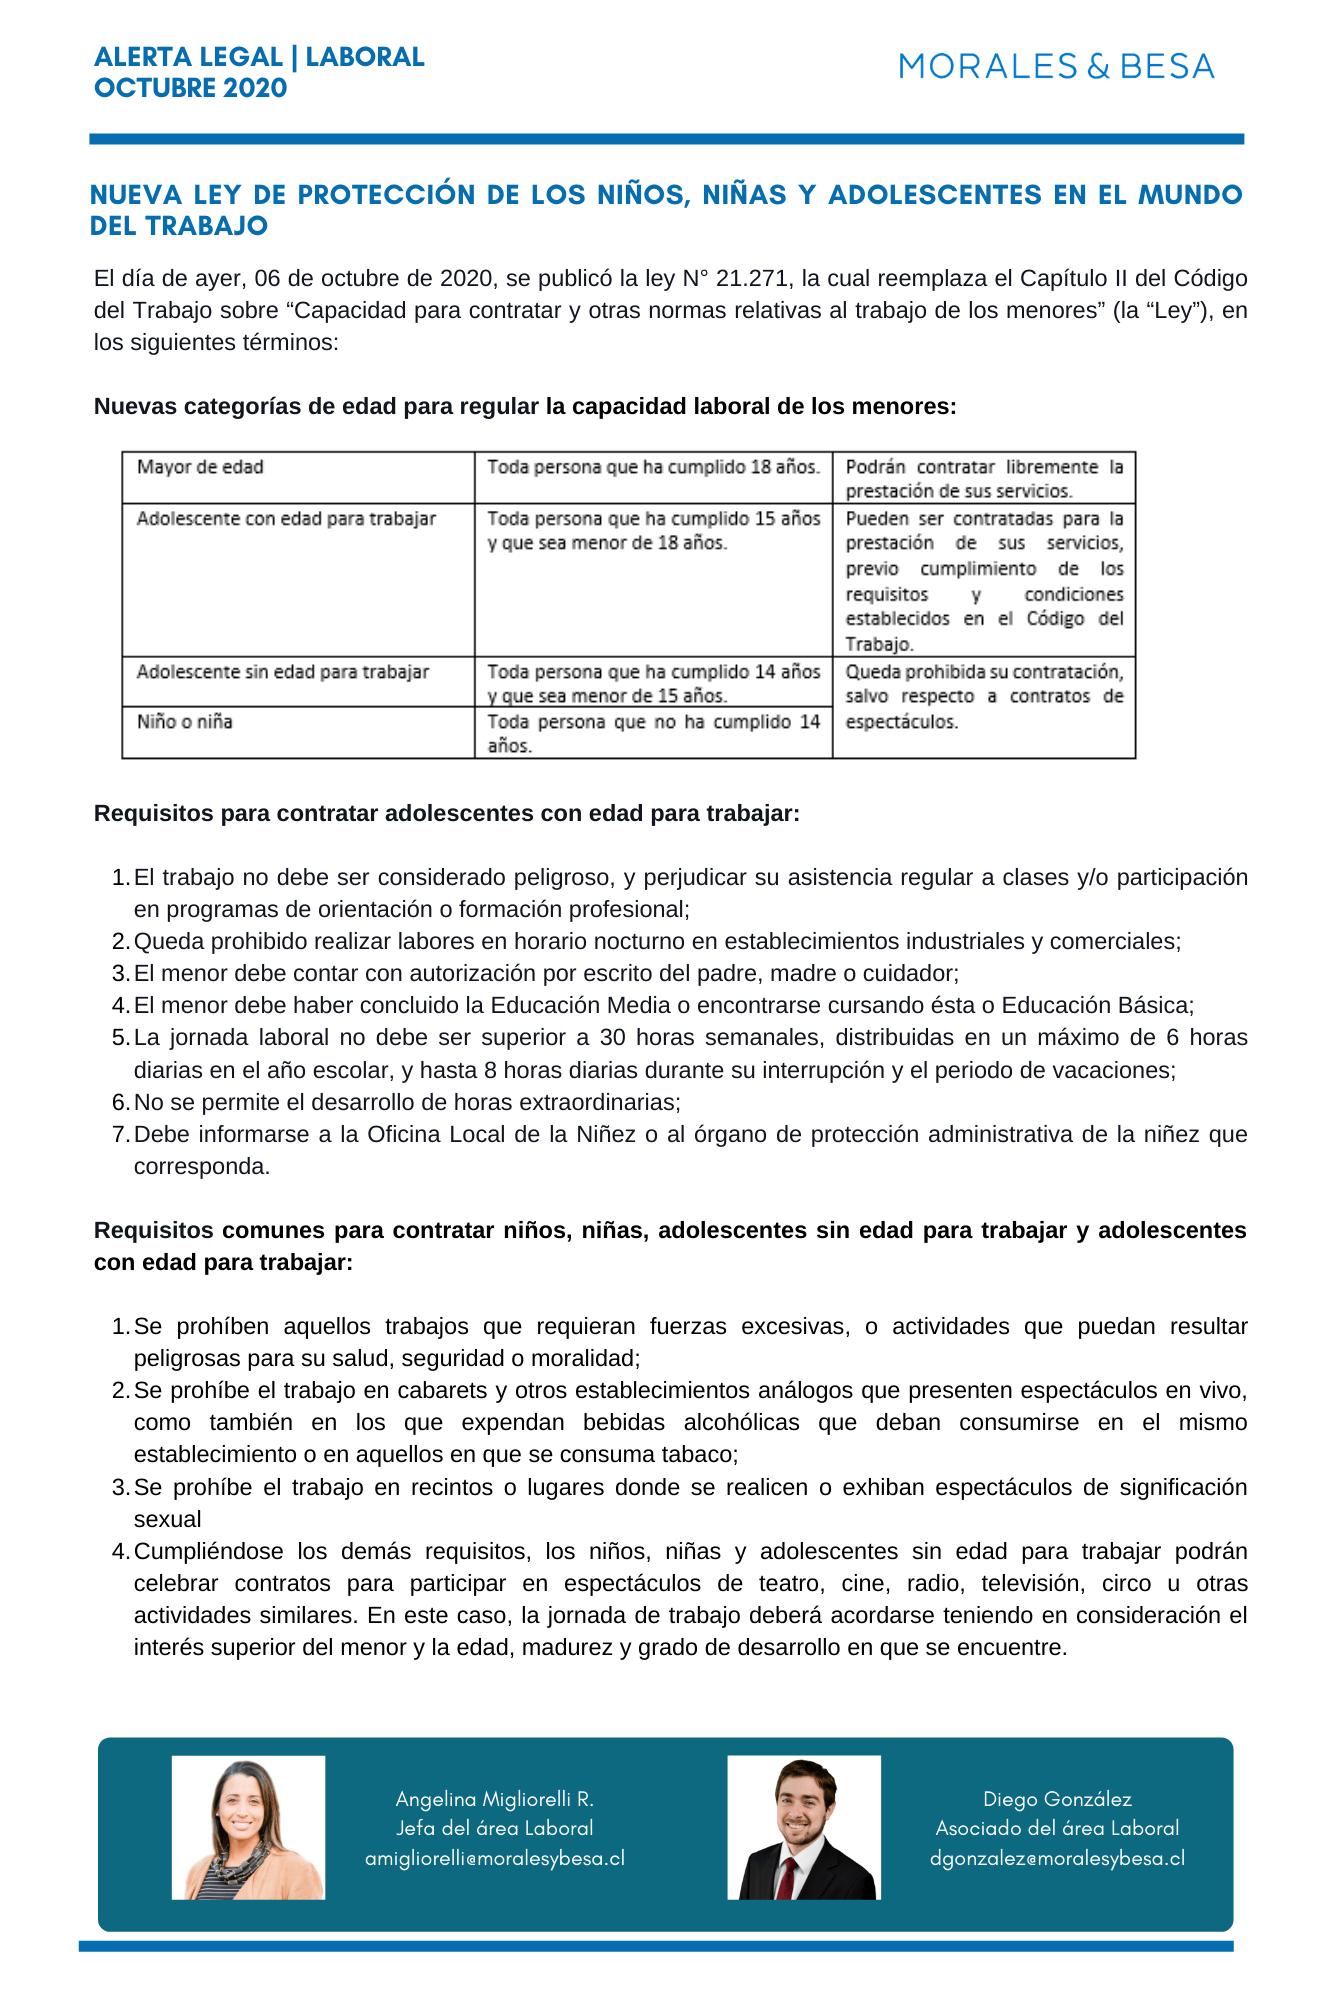 Alerta Legal M&B - Laboral - Octubre 2020